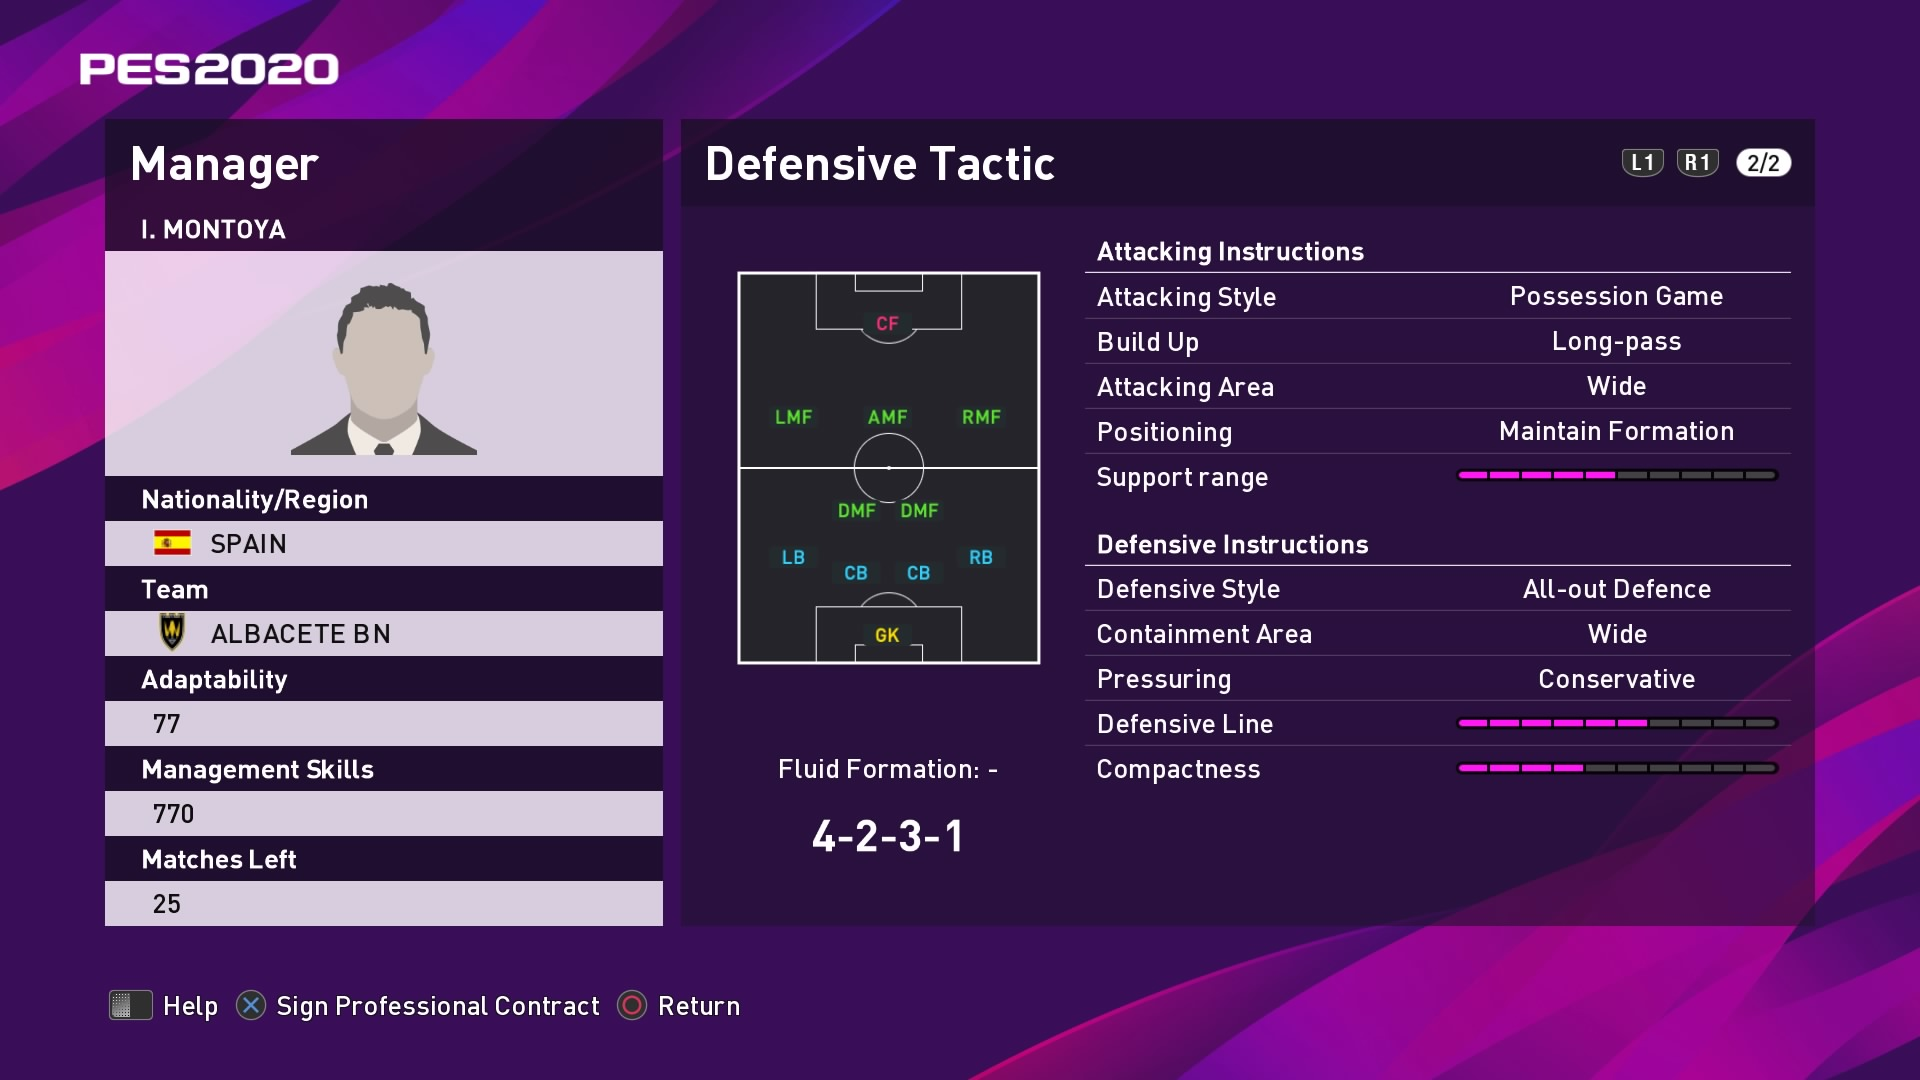 I. Montoya (Luis Miguel Ramis) Defensive Tactic in PES 2020 myClub